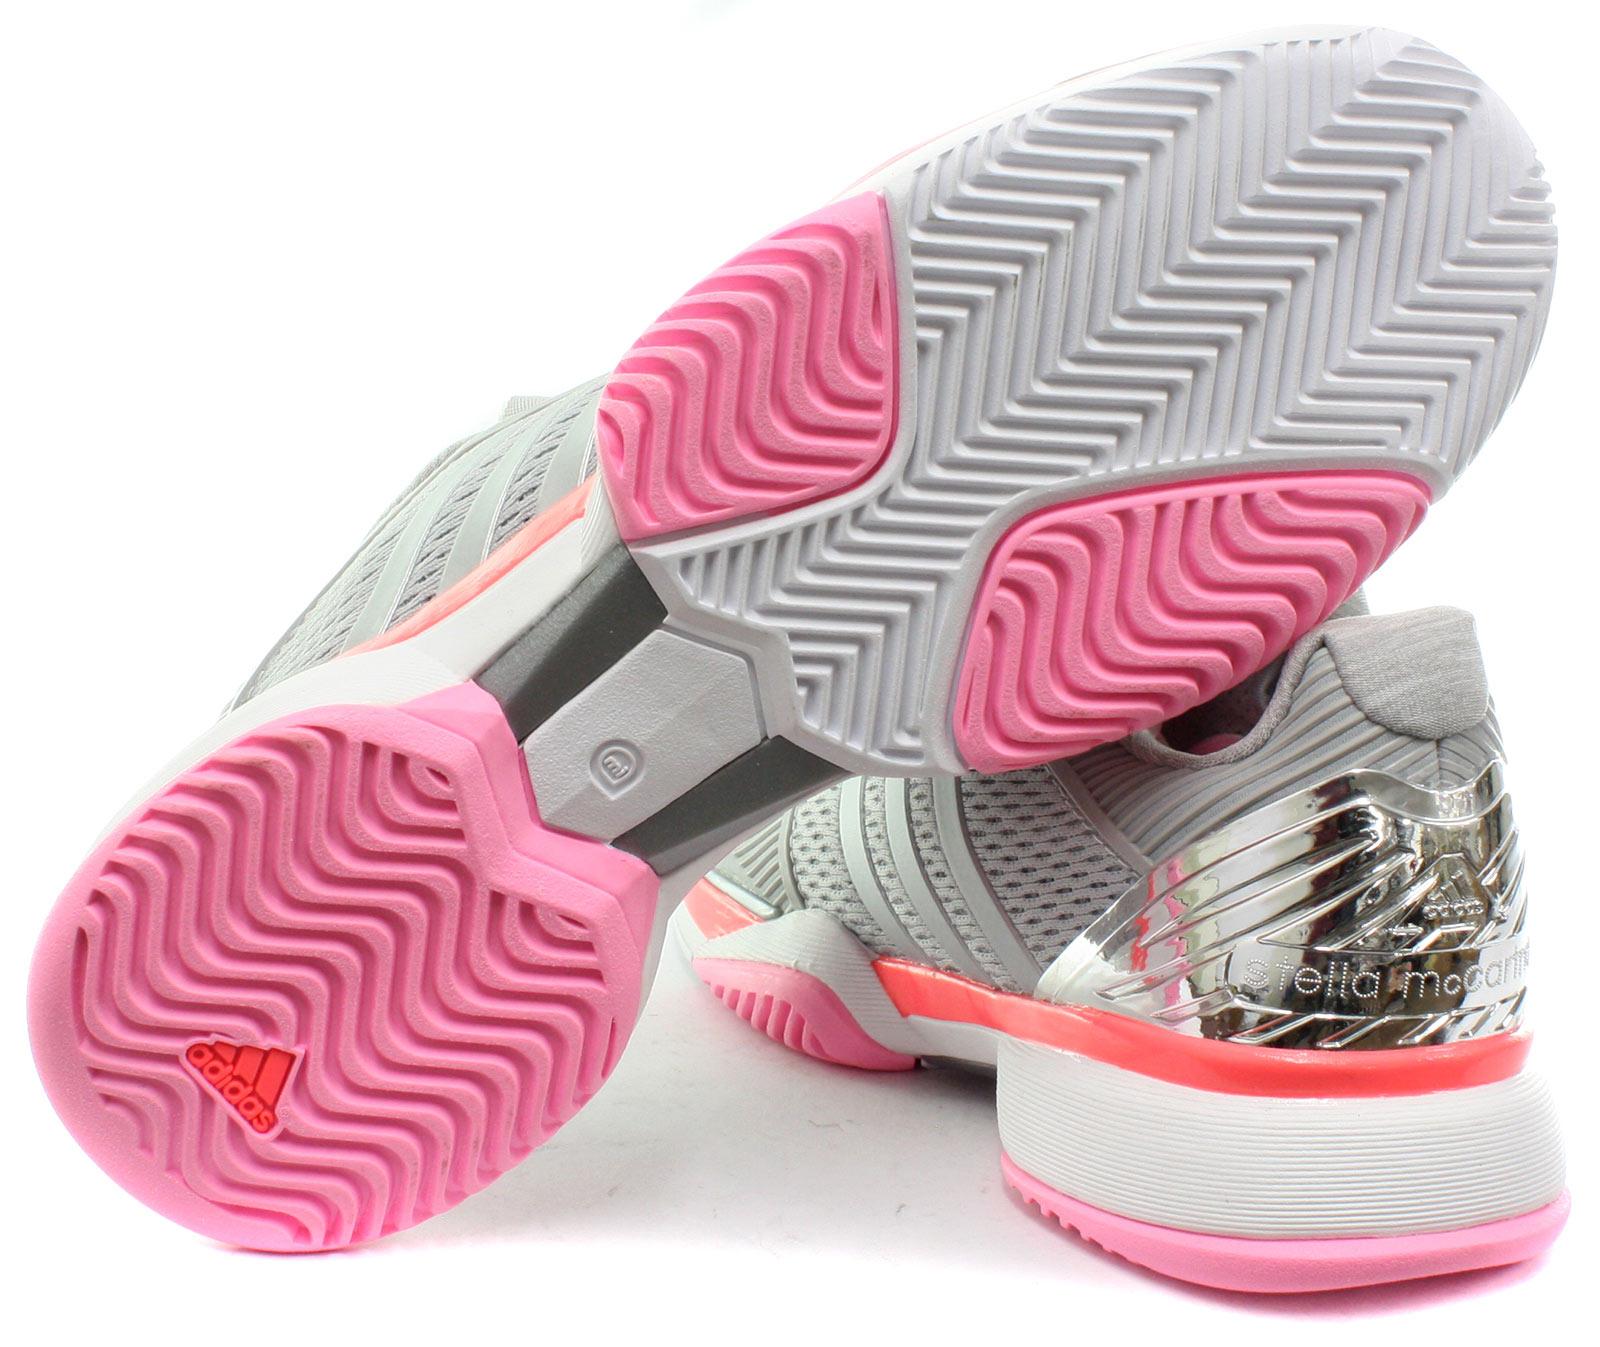 Adidas Stella Mccartney Tennis Pour Les Femmes bnf1uOendr